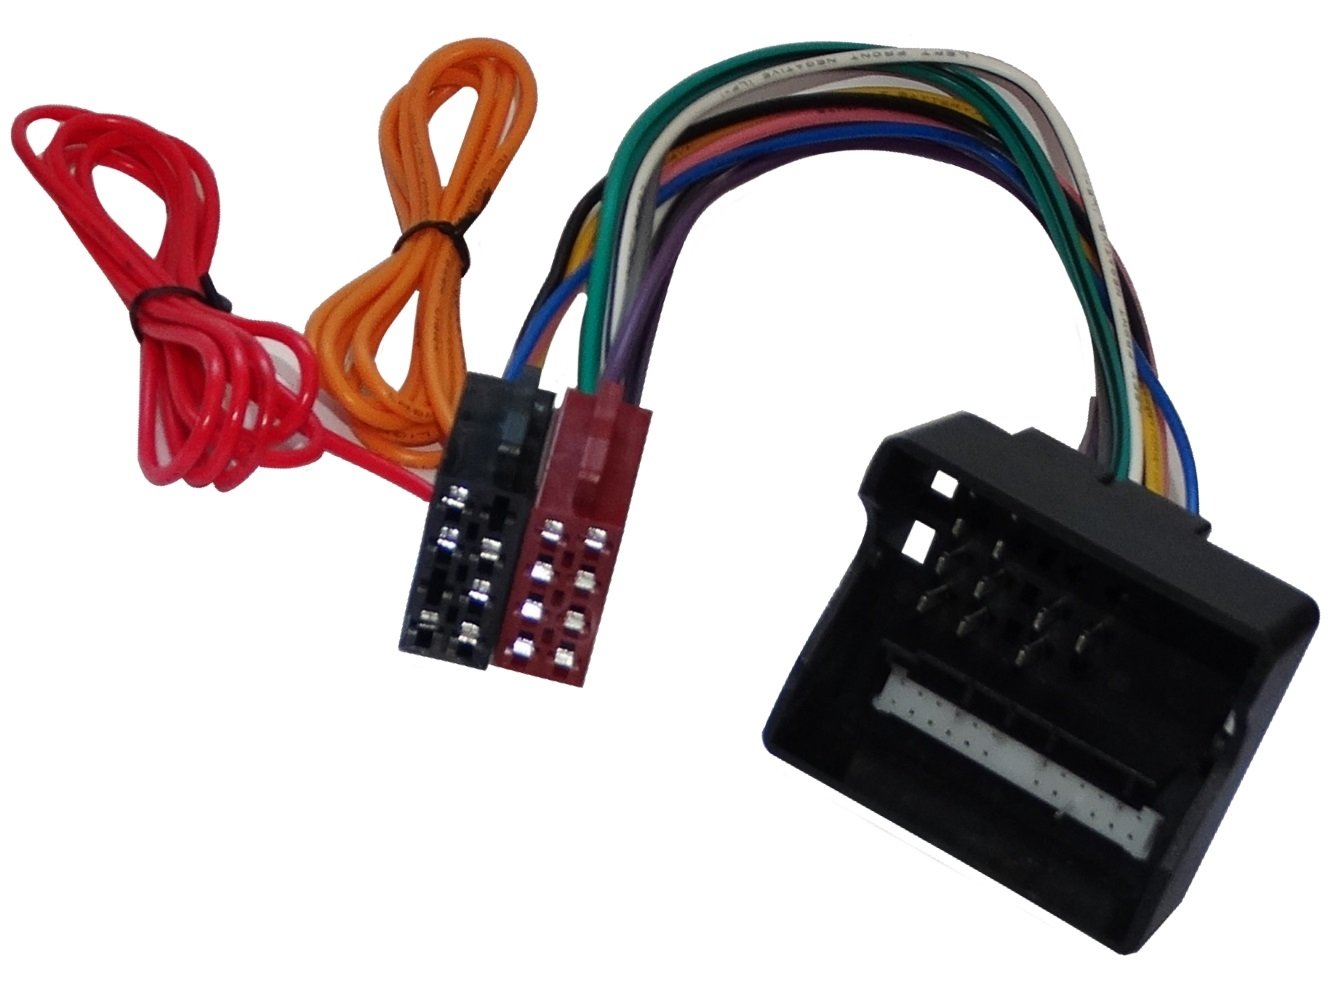 Aerzetix - Adattatore cavo con spina per autoradio ISO per veicoli . SK2-C11158-R203